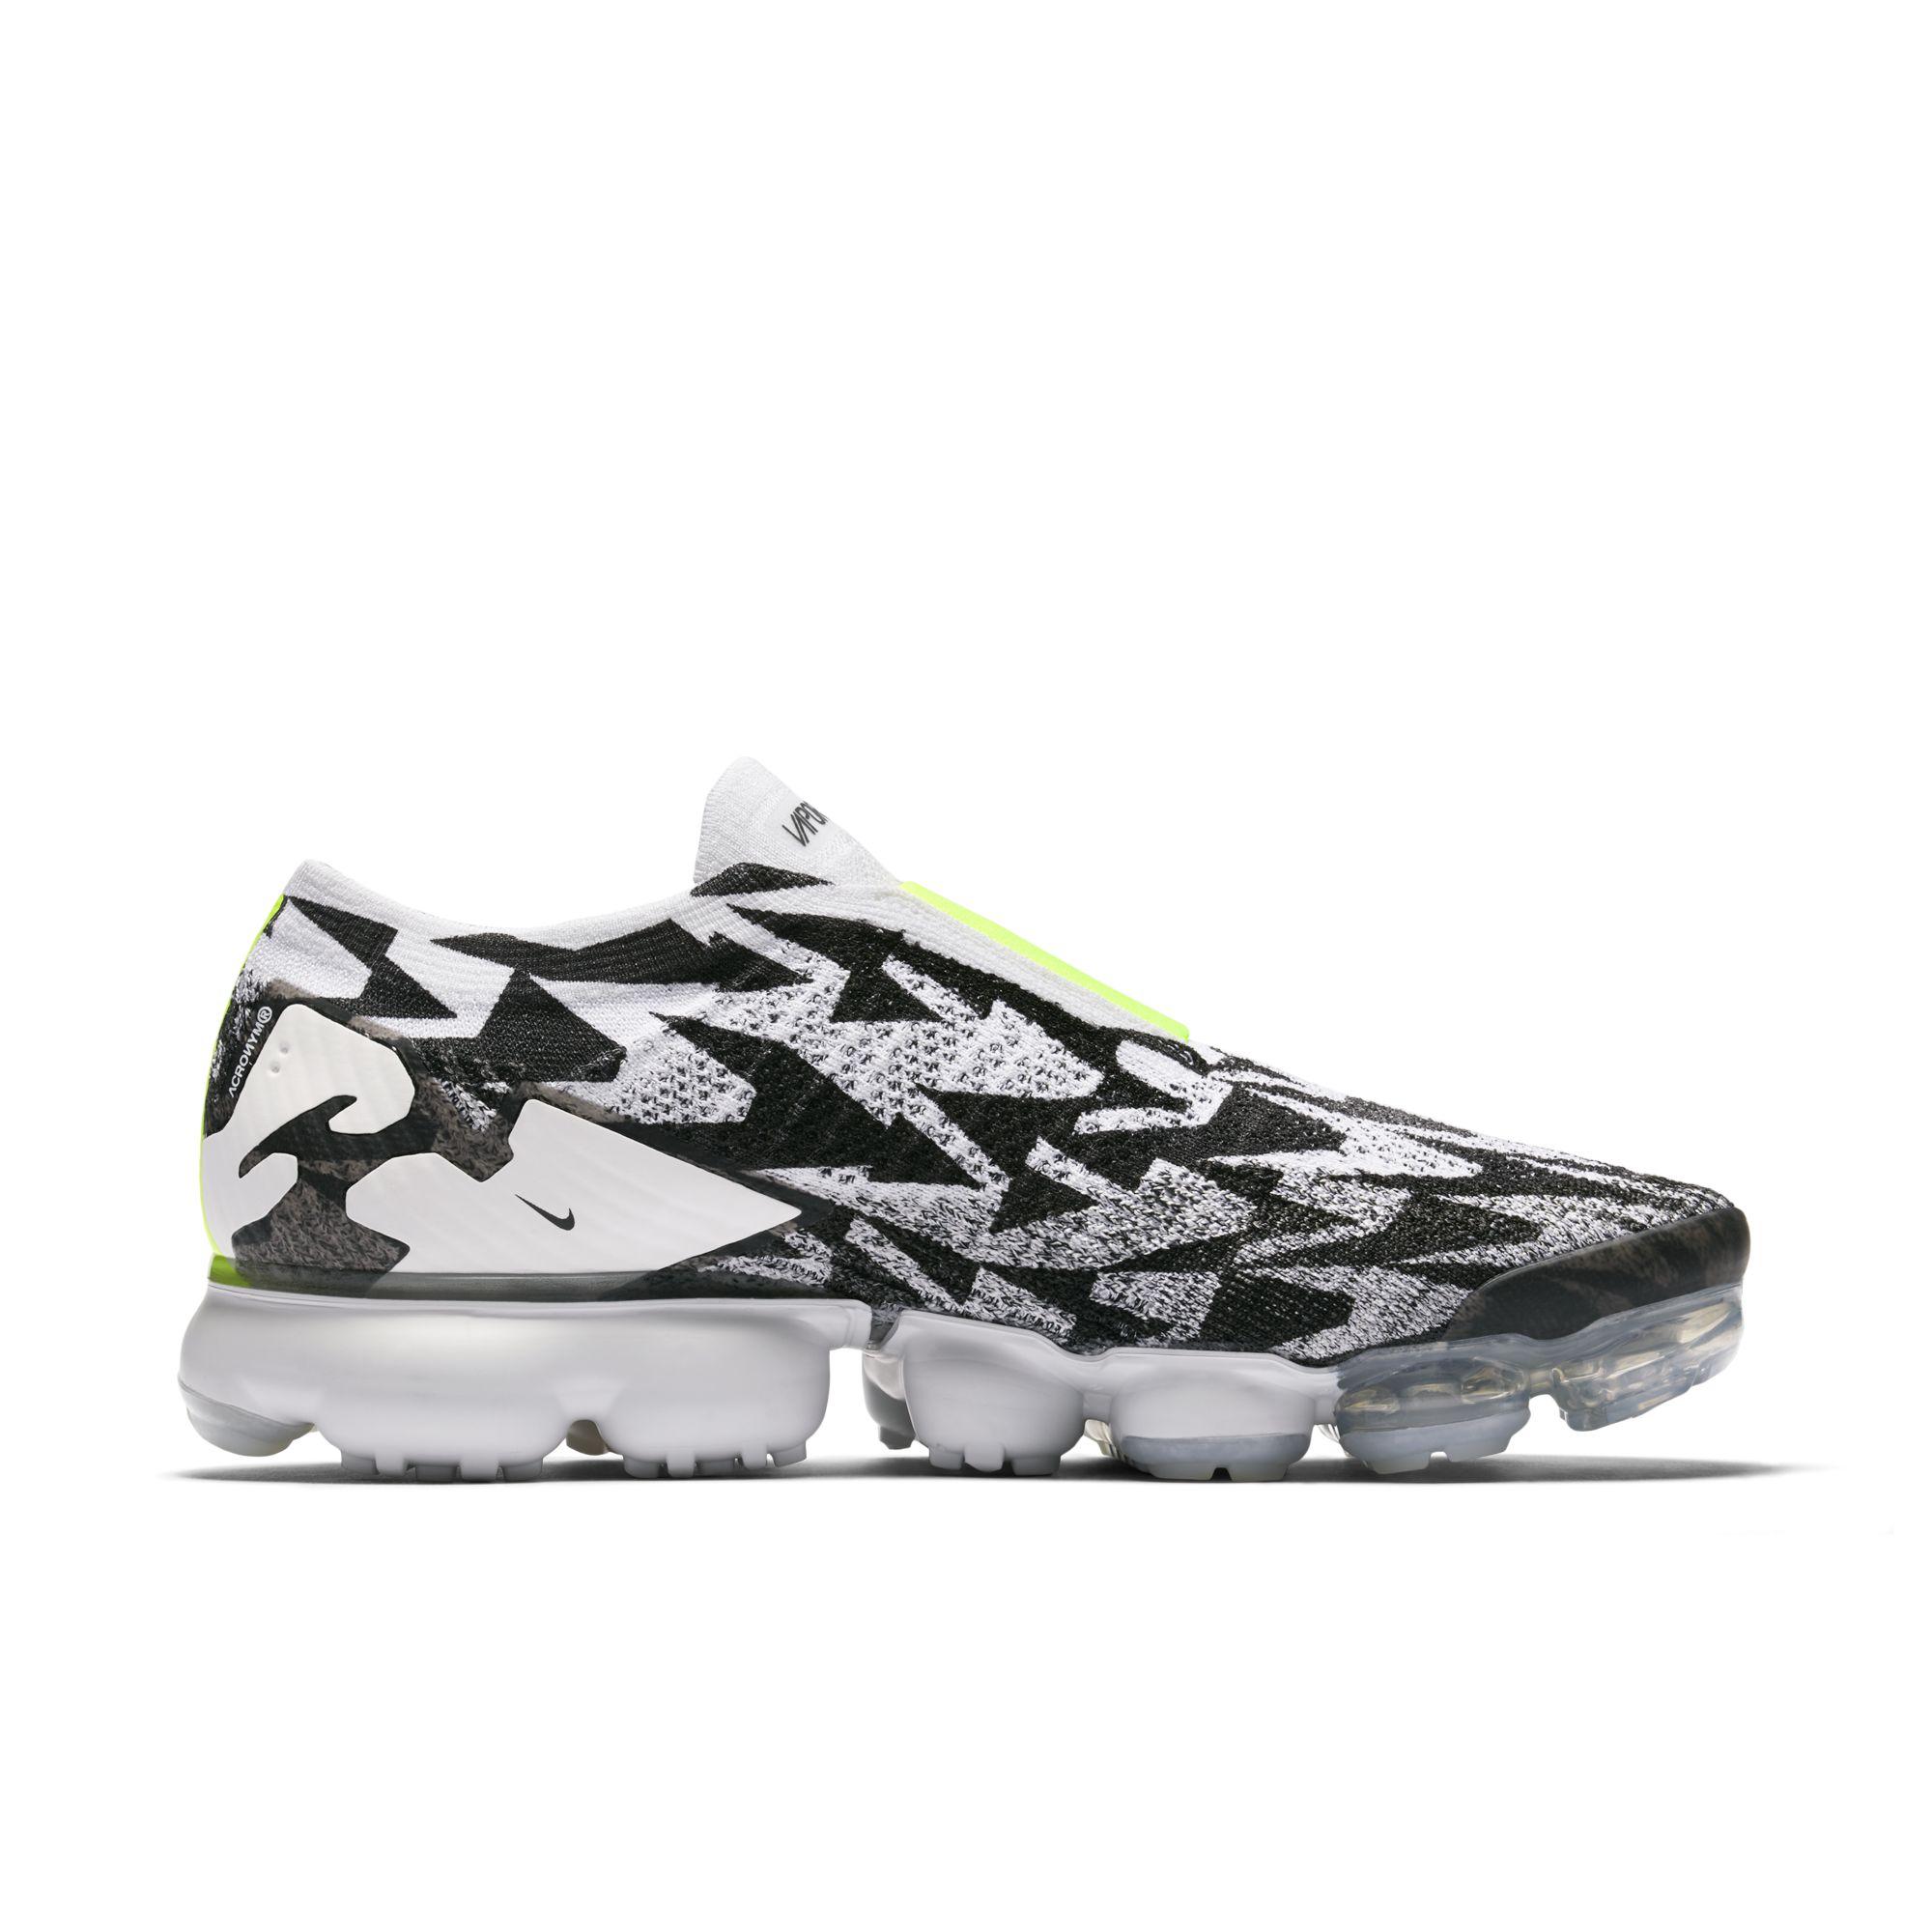 + Acronyme Air Vapormax Flyknit Moc 2 Chaussures De Sport - Noir Nike tCmoxhU2cp